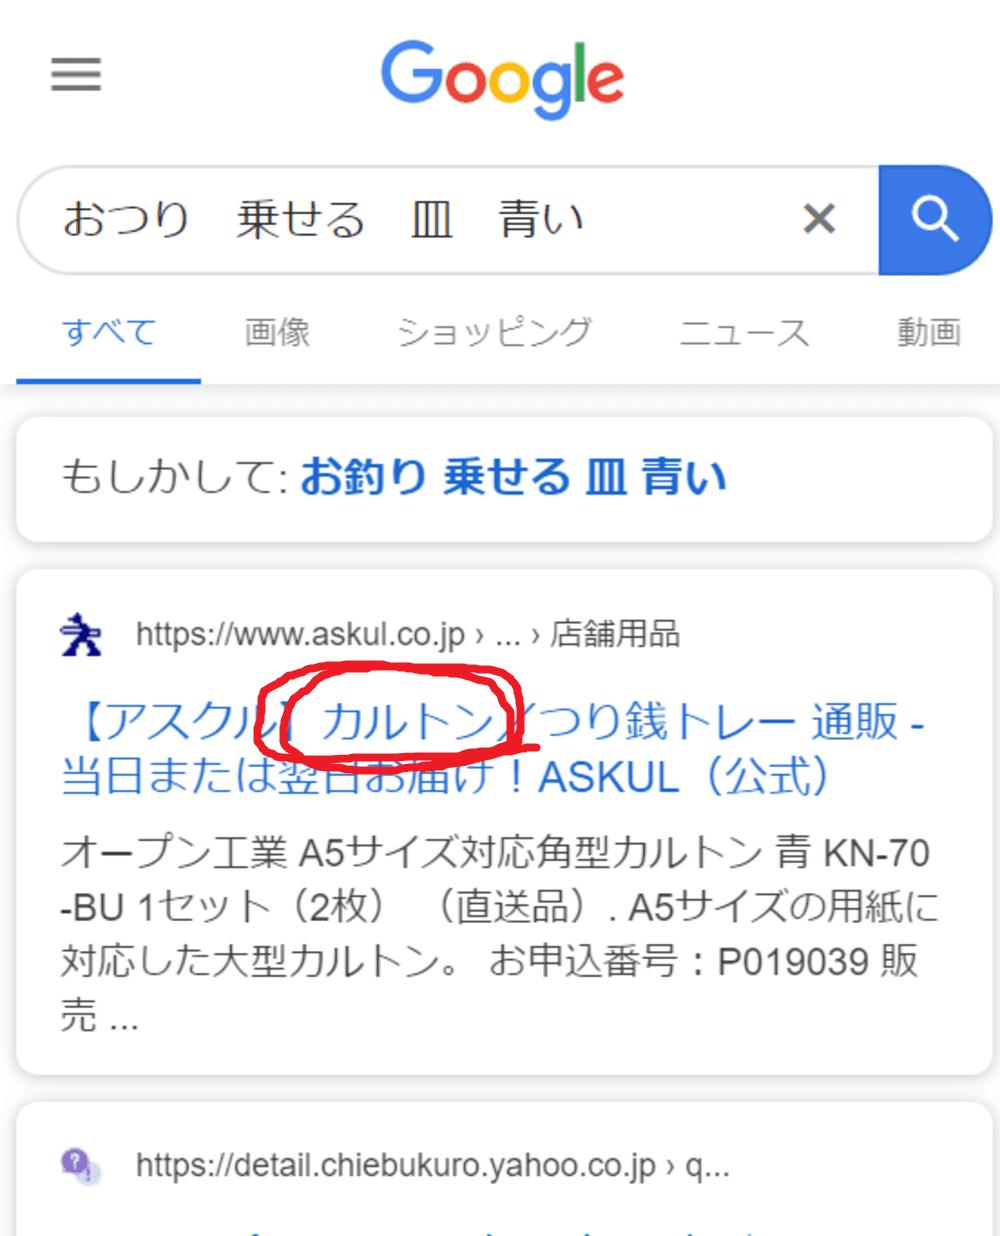 SnapCrab_NoName_2019-6-3_11-54-27_No-00